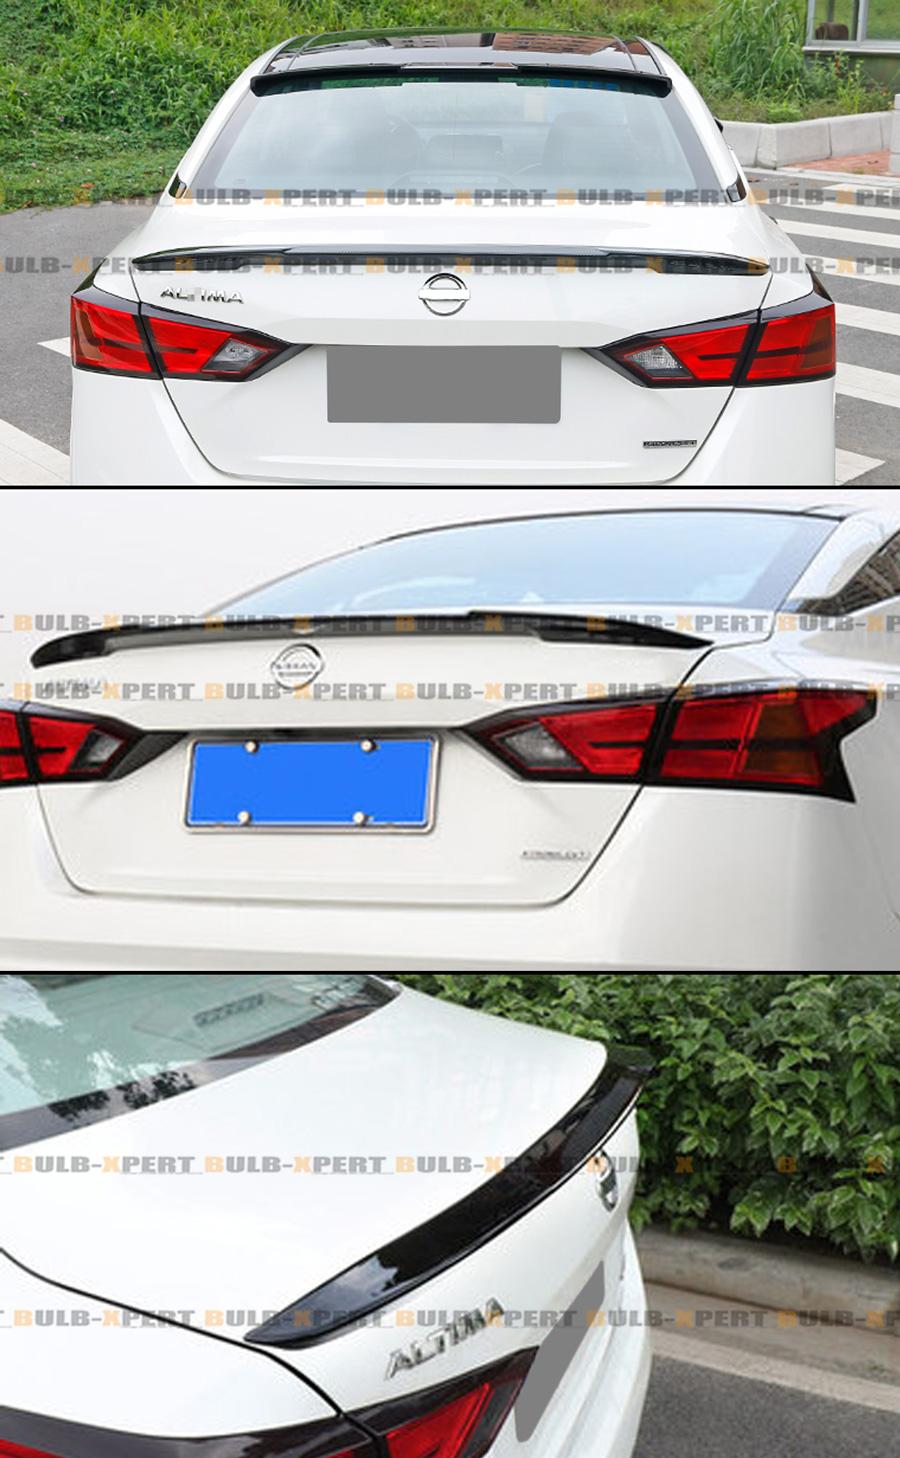 Painted Black Trunk Lip Spoiler R For Nissan Altima L31 Sedan 02-06 Gen 3